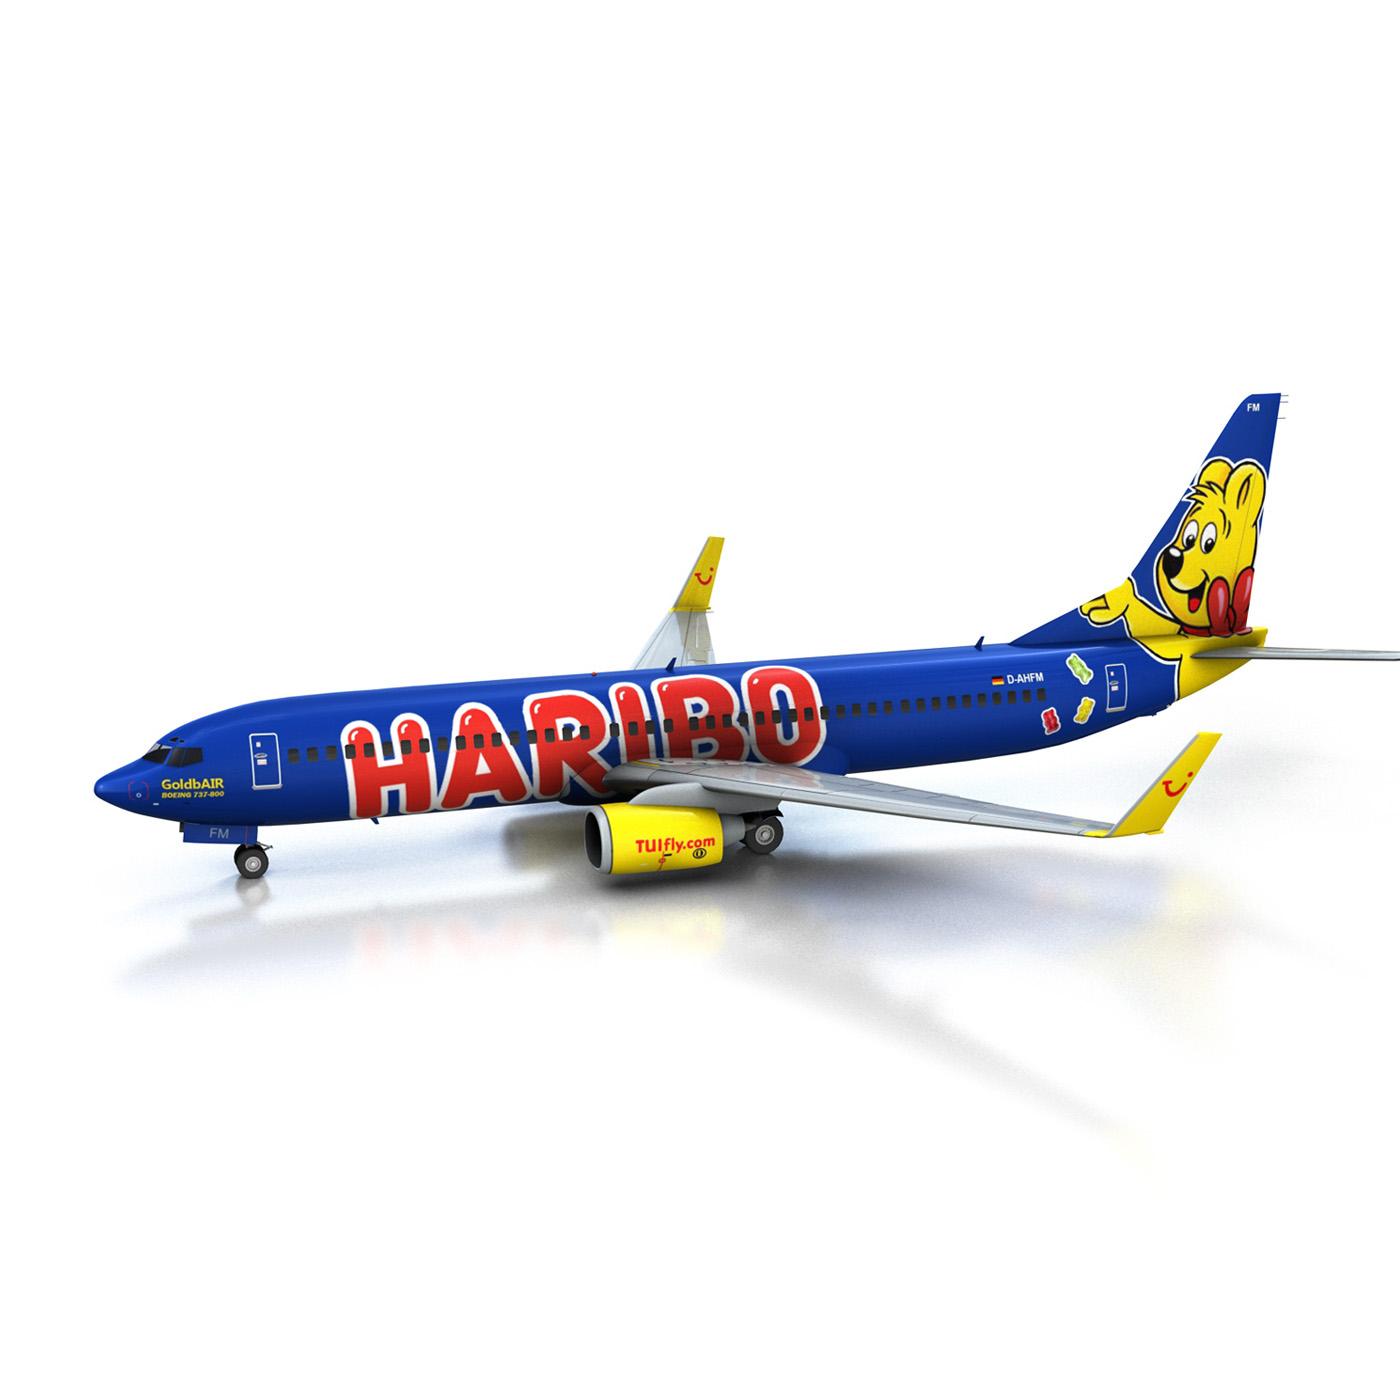 boeing 737-800 goldbair 3d model 3ds fbx c4d lwo obj 293494